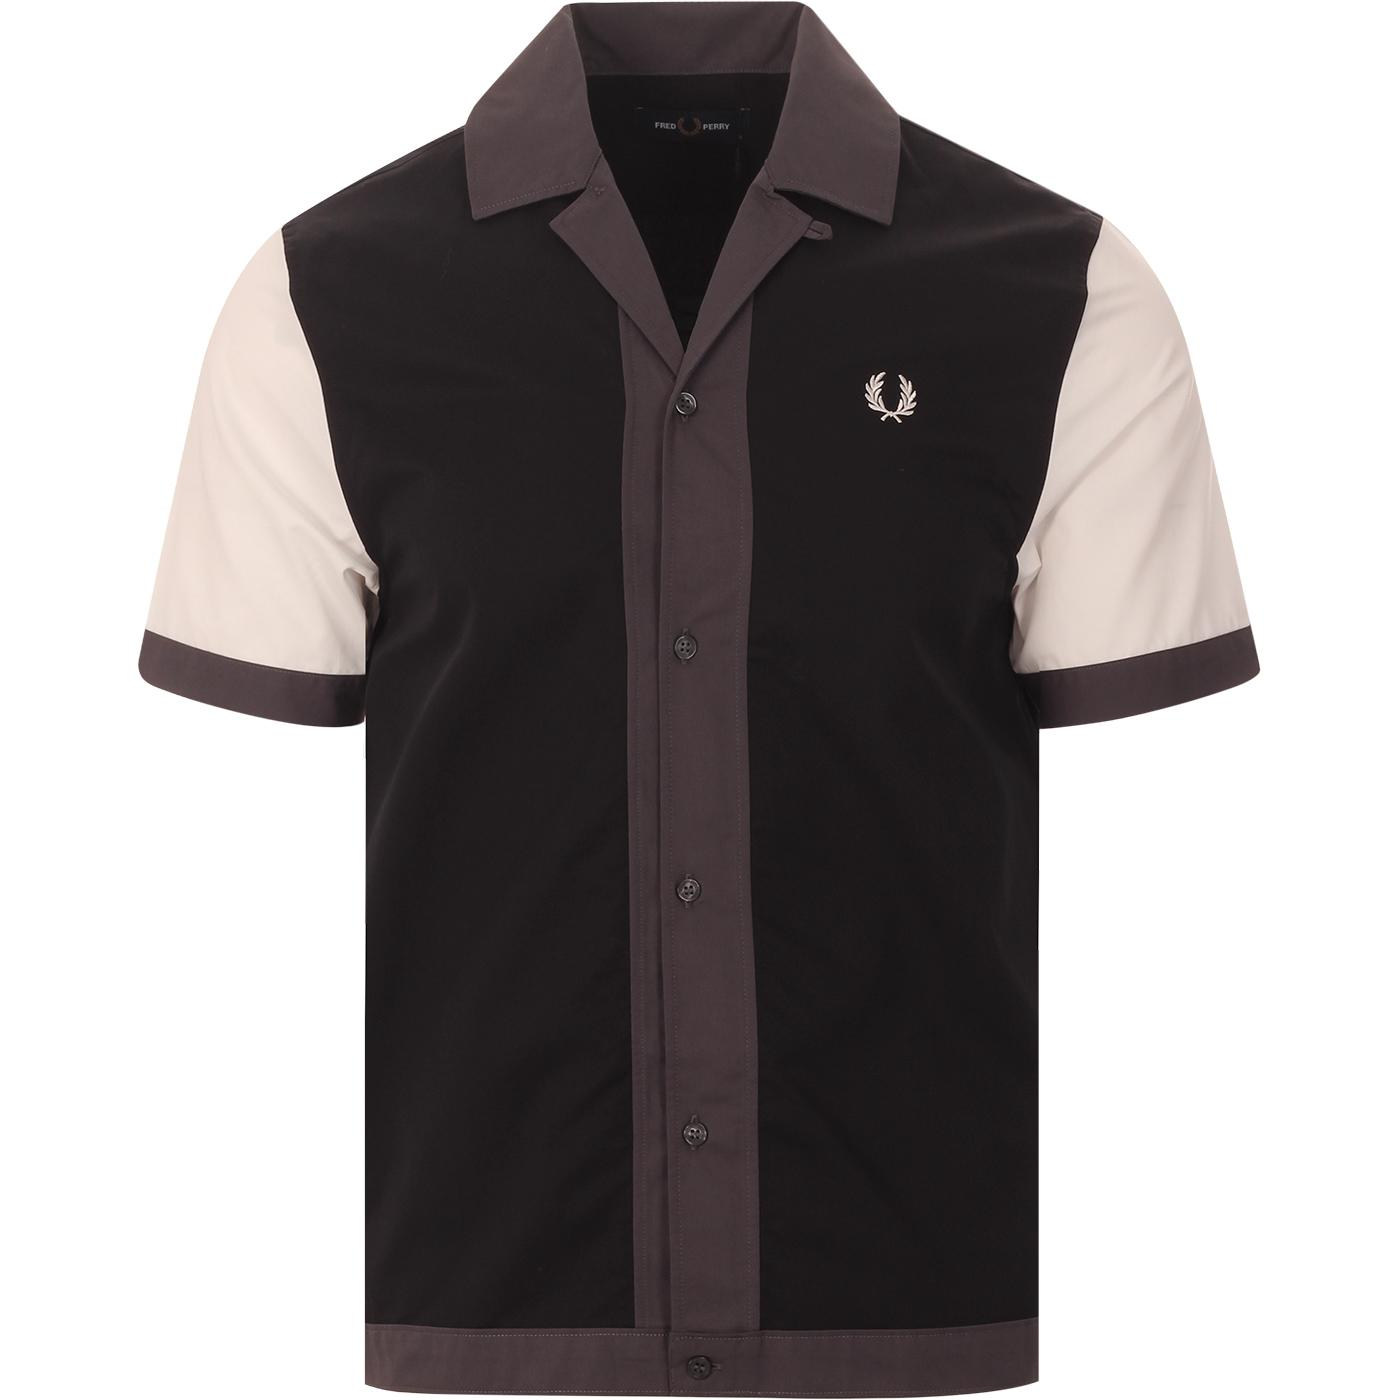 FRED PERRY Retro Colour Block Revere Collar Shirt